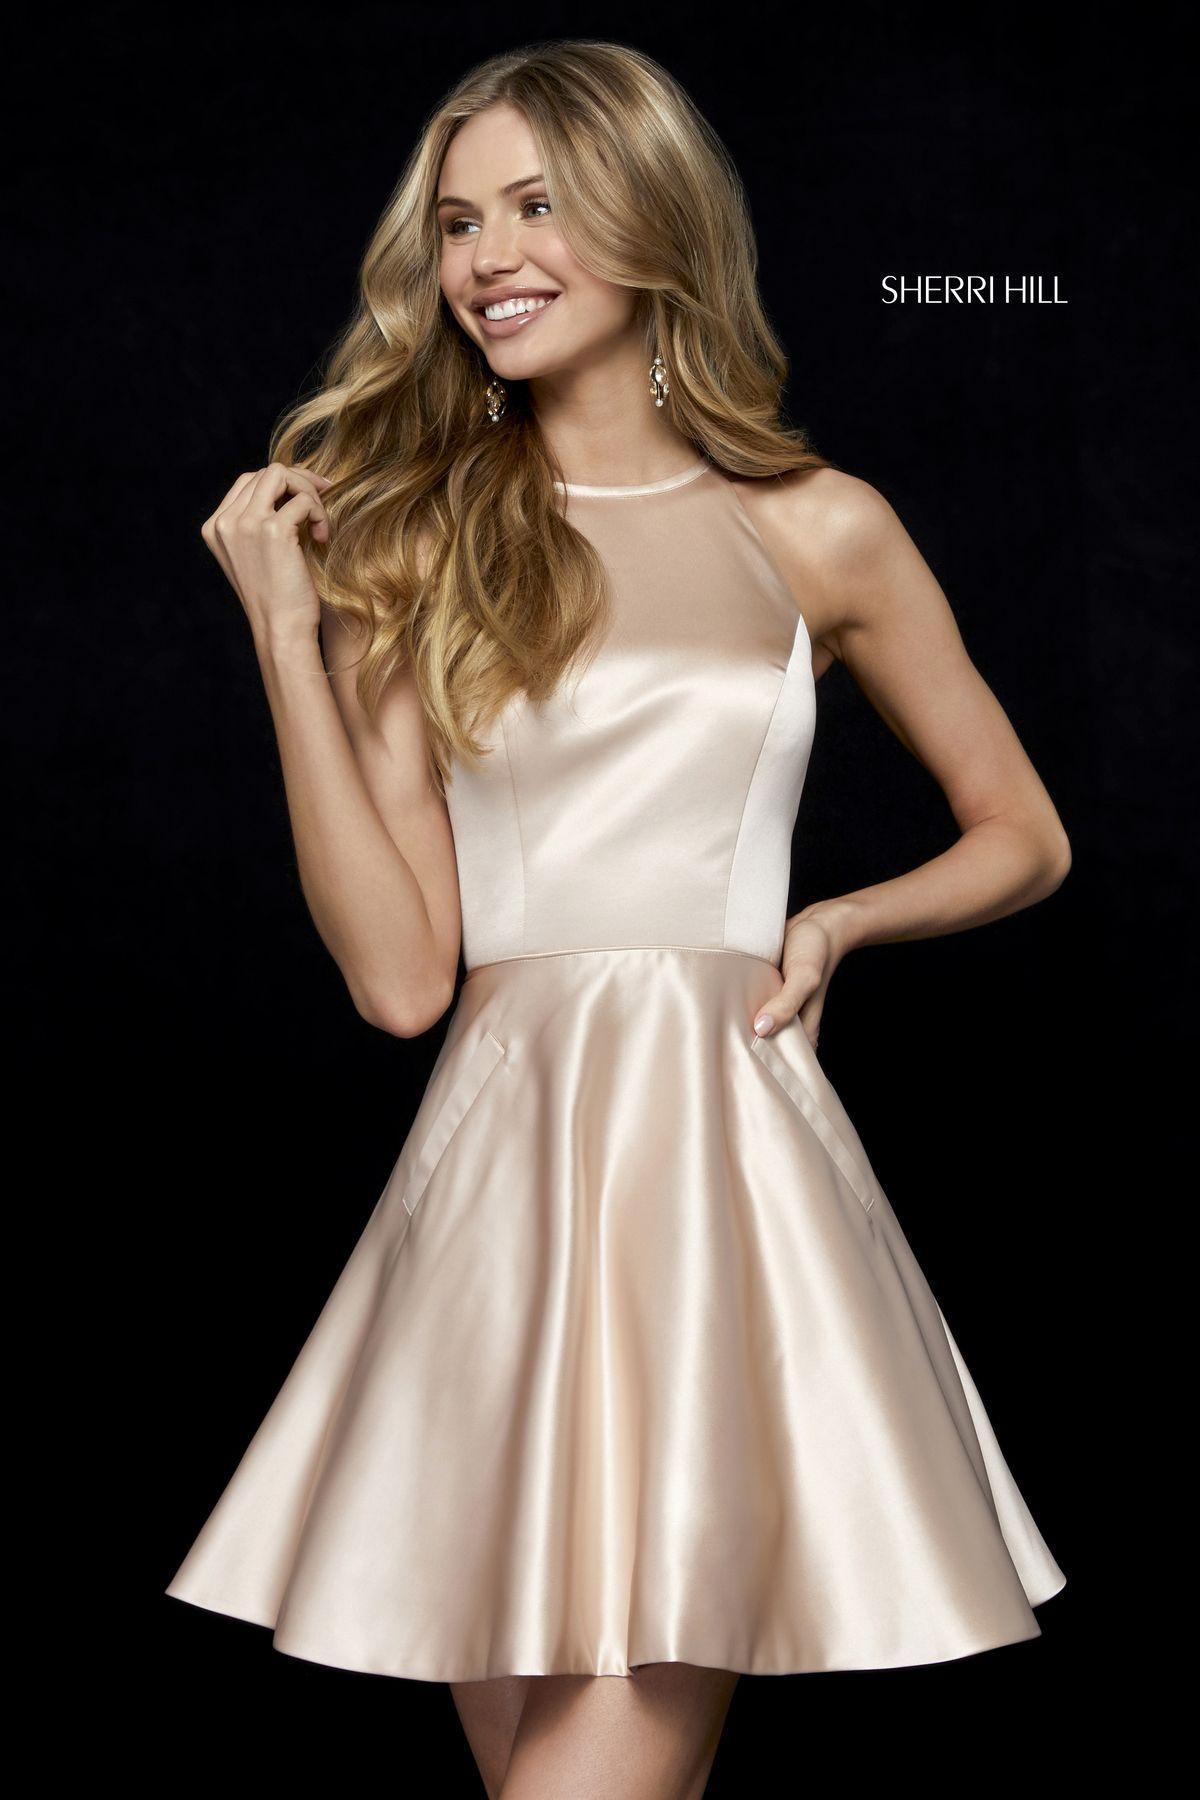 Style haven elizabeth pinterest prom sherri hill short